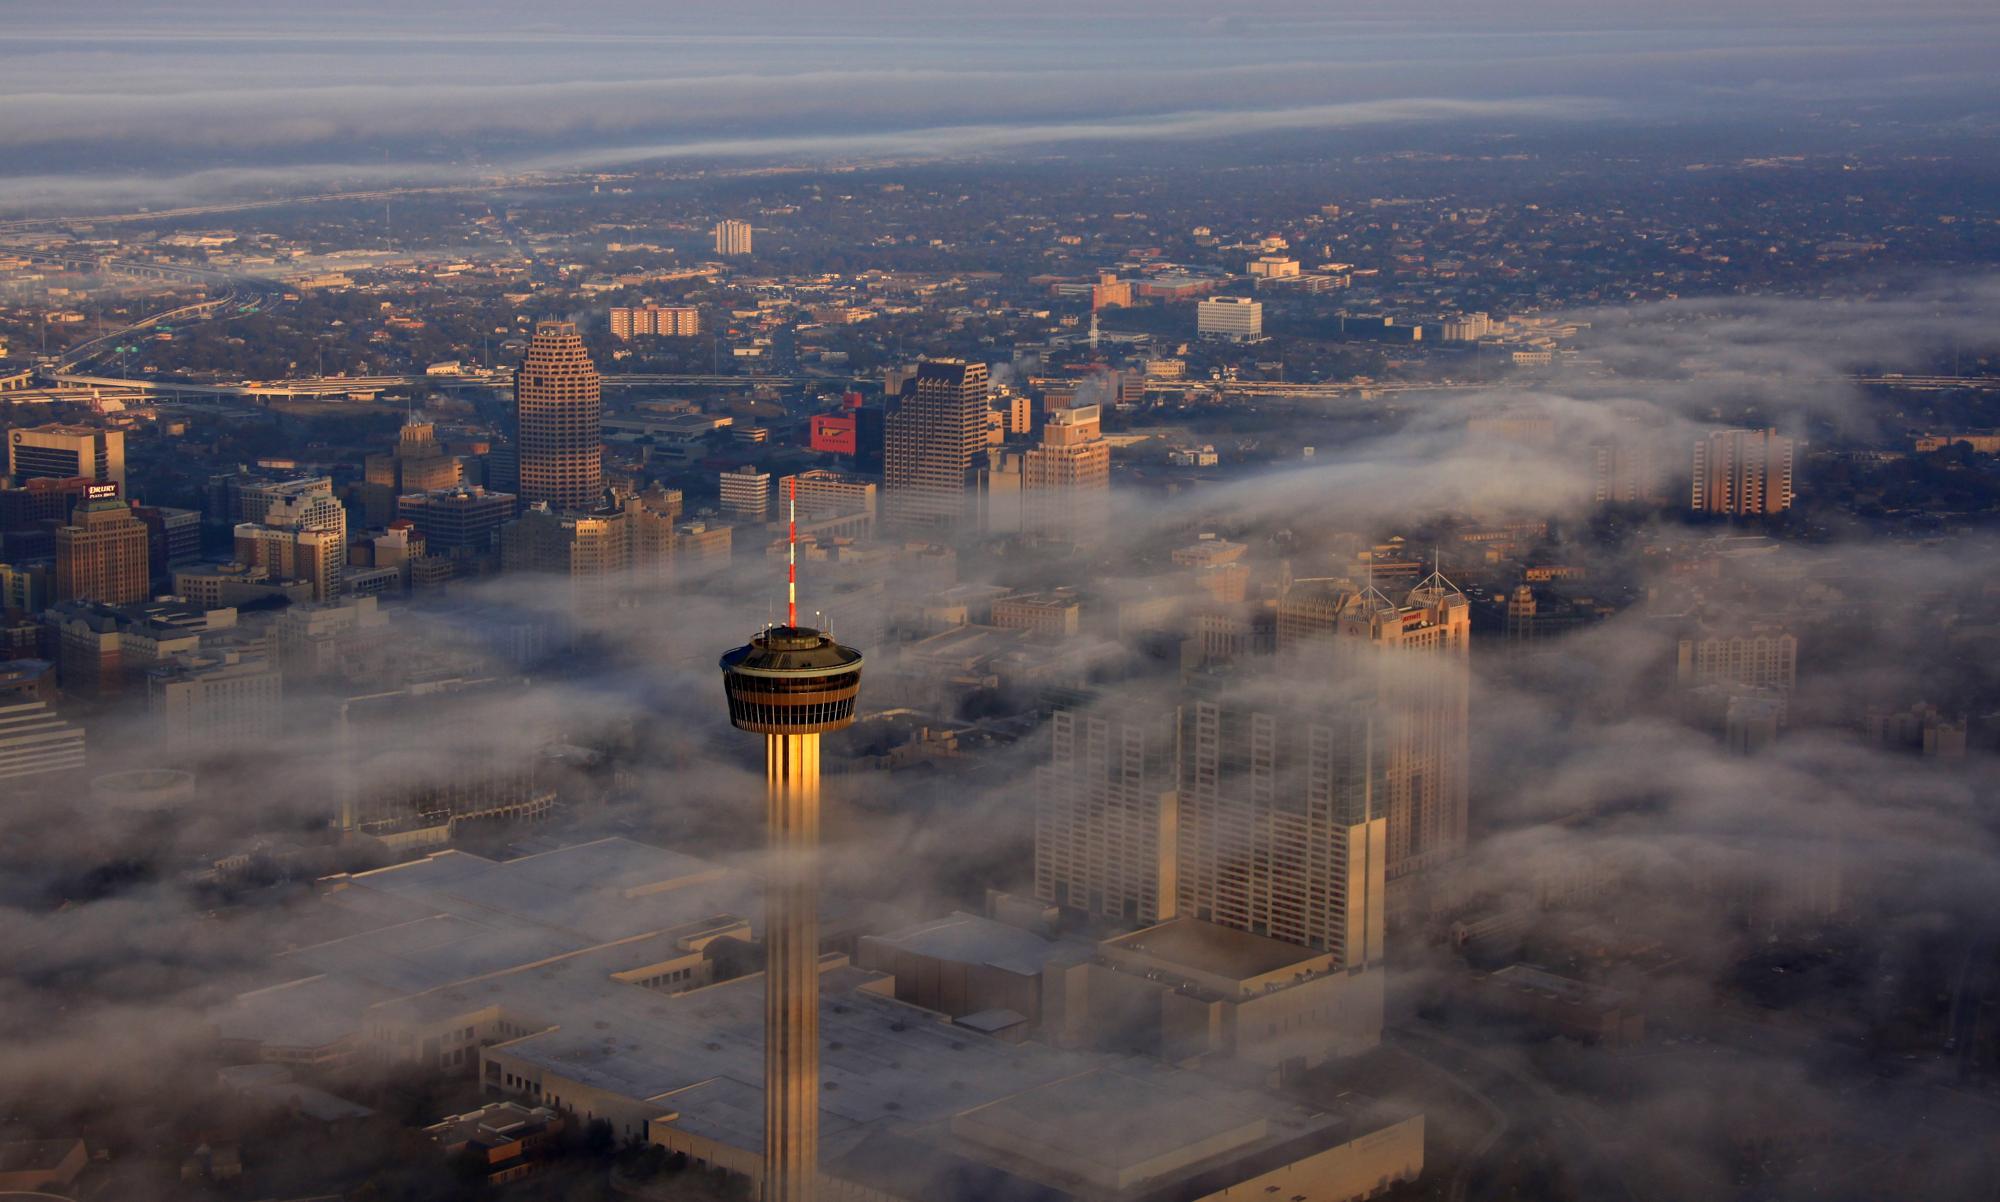 Whispy Dawn, San Antonio, Texas - Texas Aerial Photographer - Aerial Drone Photo Image - San Antonio, TX